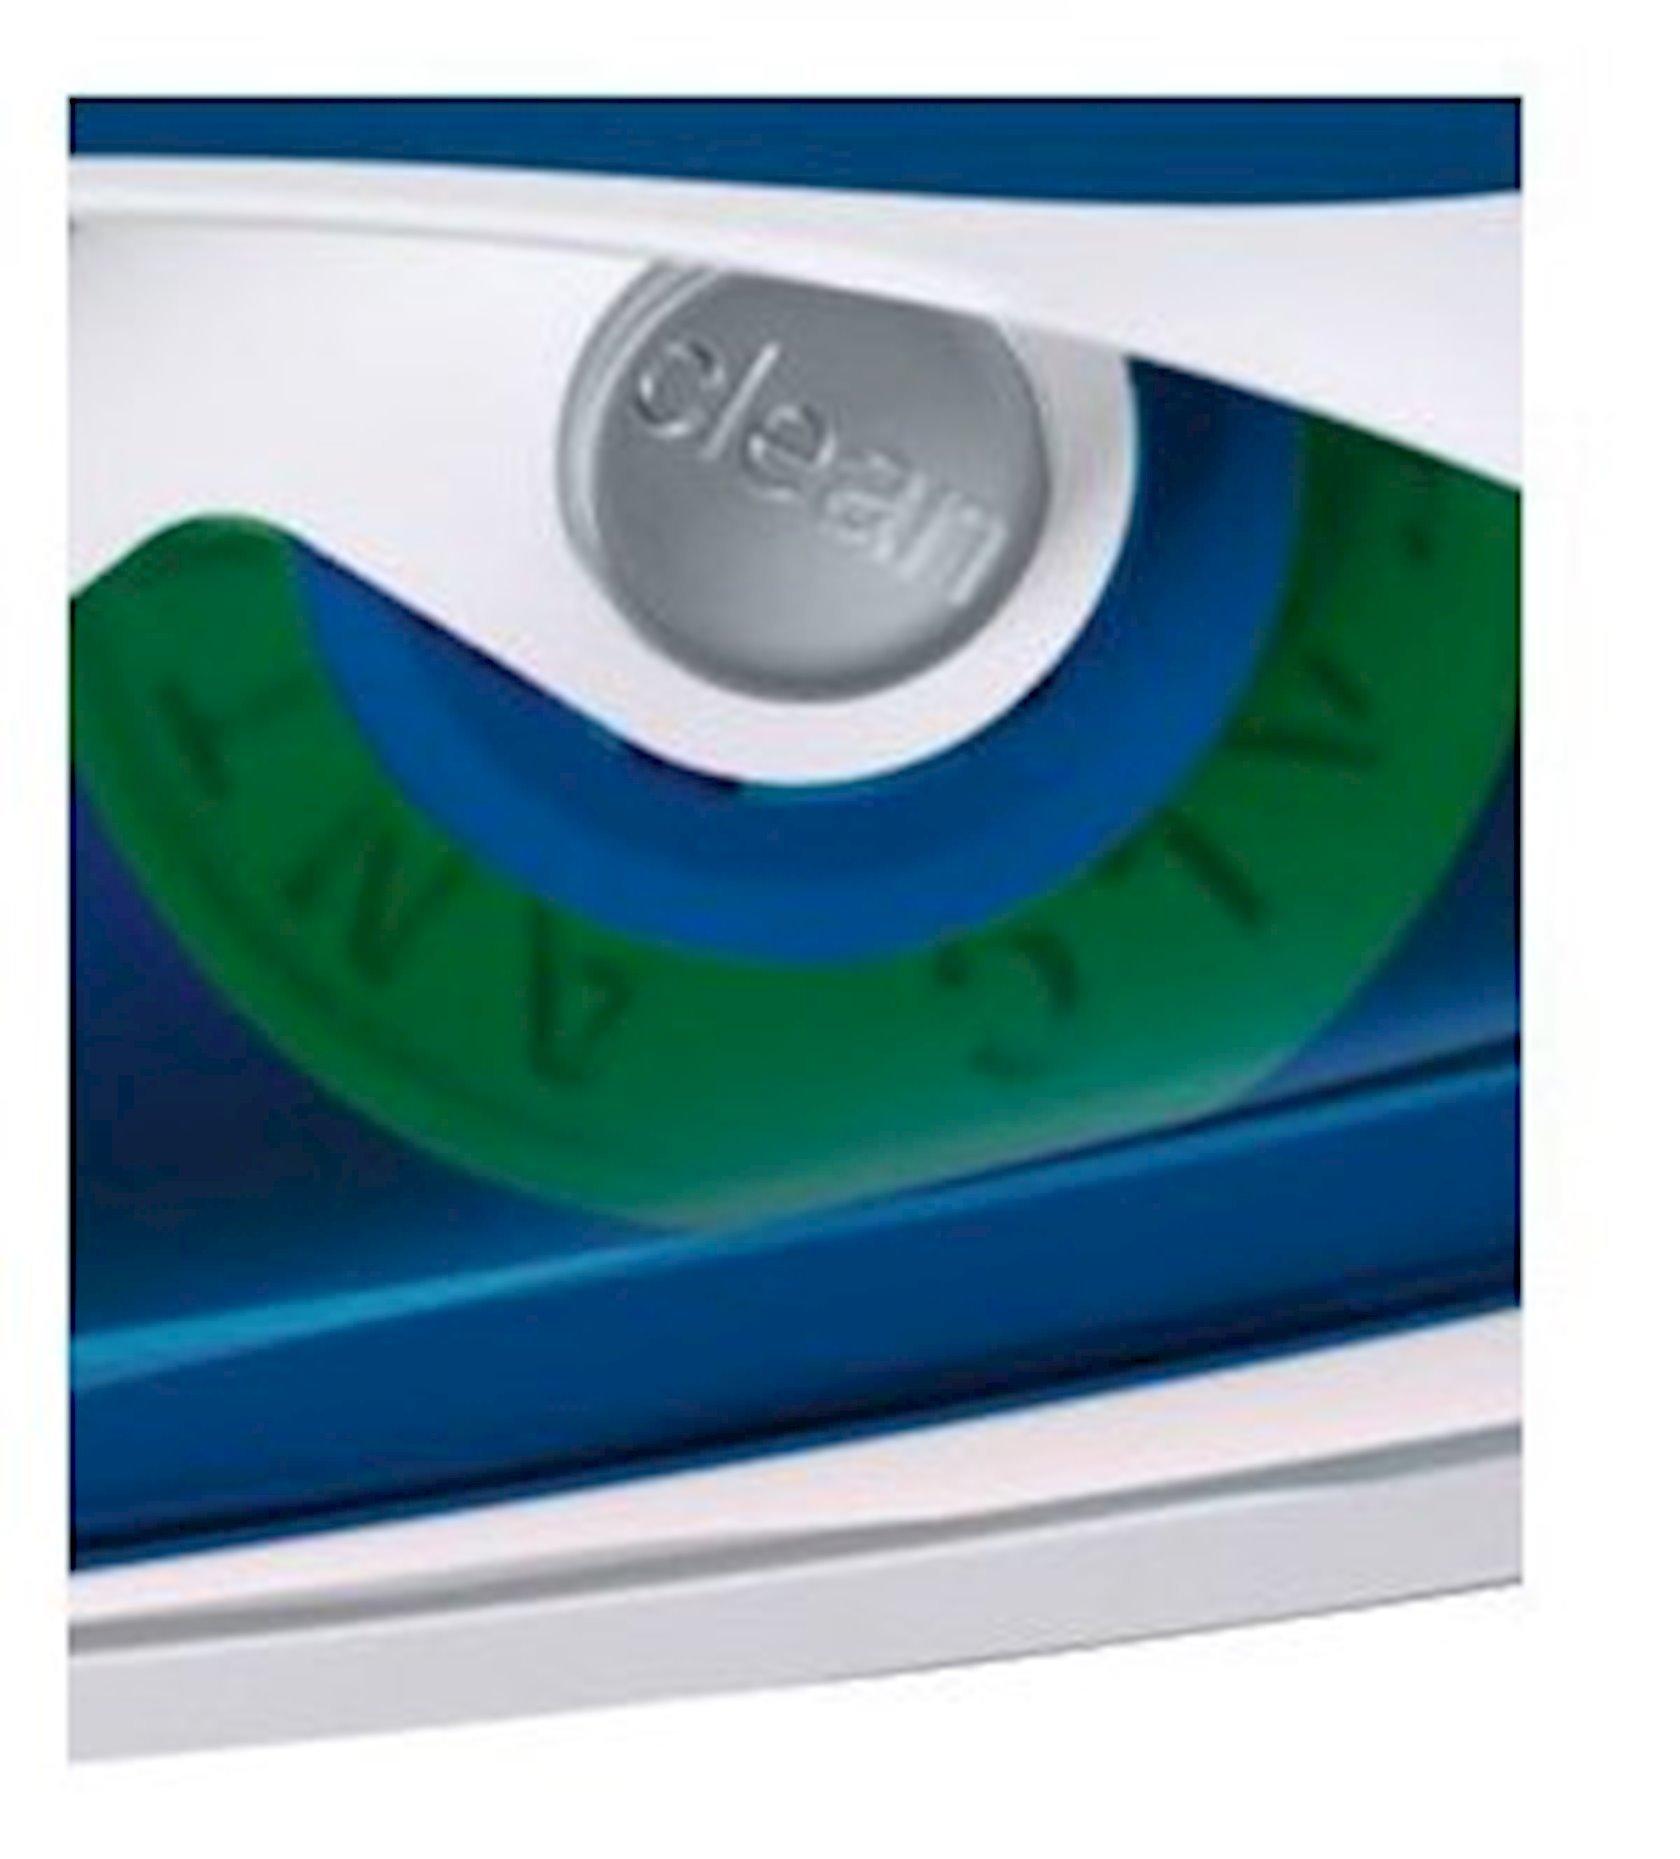 Ütü Bosch TDA 5028010